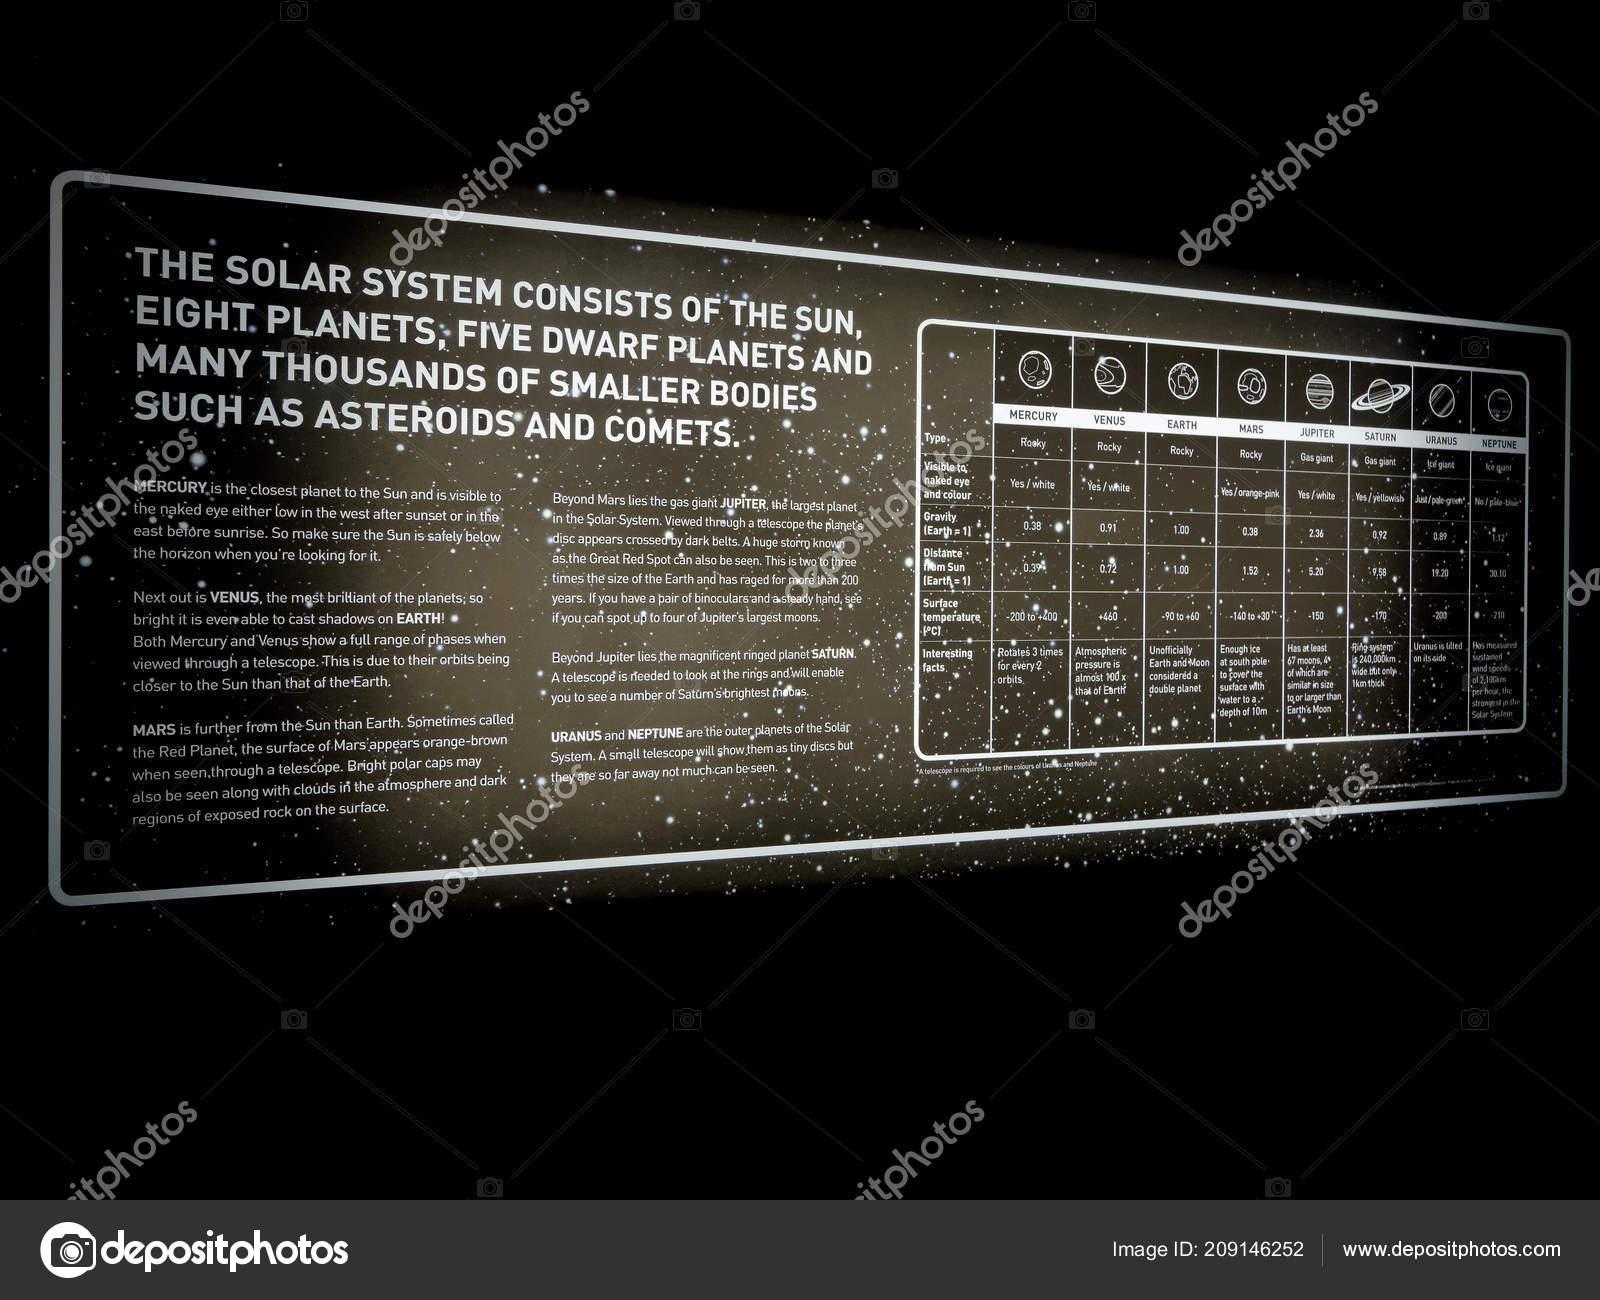 8b076a422a2 Αθήνα Ιανουαρίου Madame Tussauds Μπλάκπουλ Ηνωμένο Βασίλειο 2018 Ηλιακό  Μας– Εκδοτικές Φωτογραφίες Αρχείου